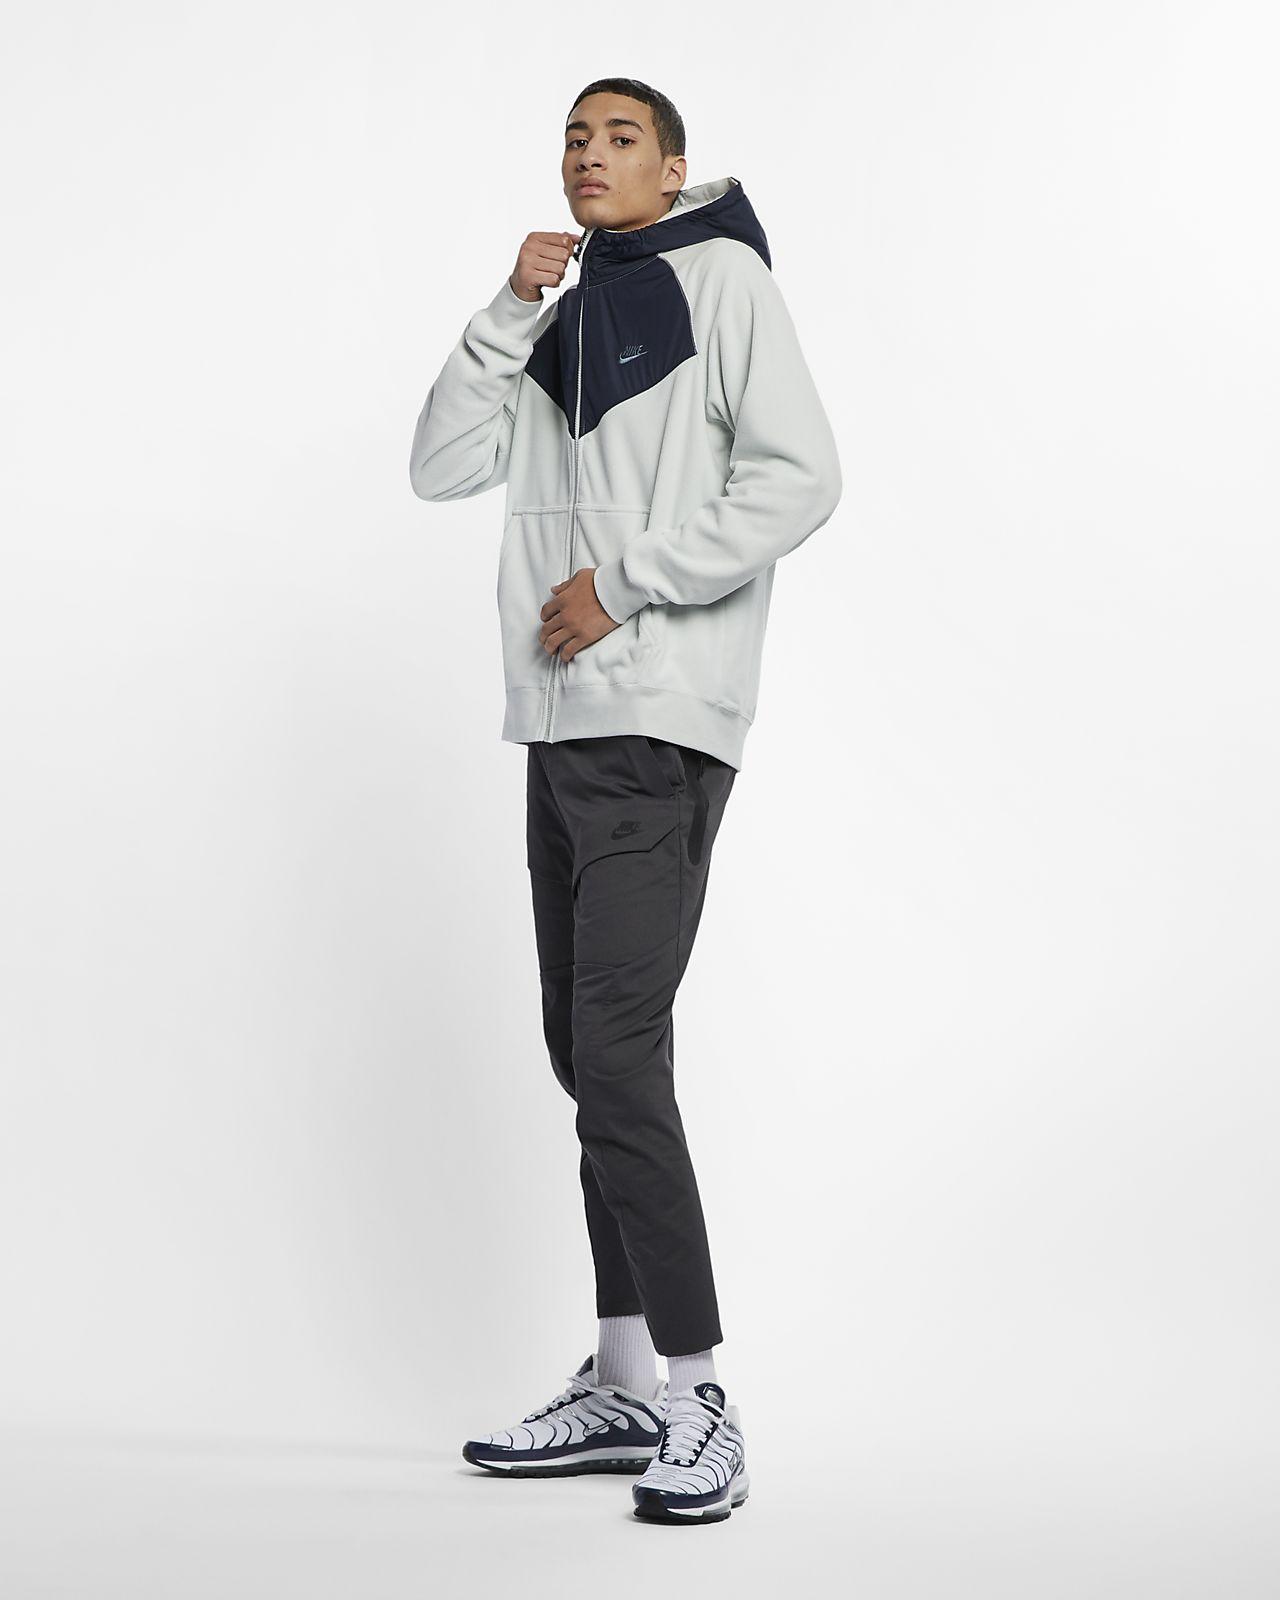 63767a3f17b497 Nike Sportswear Men s Full-Zip Hoodie. Nike.com